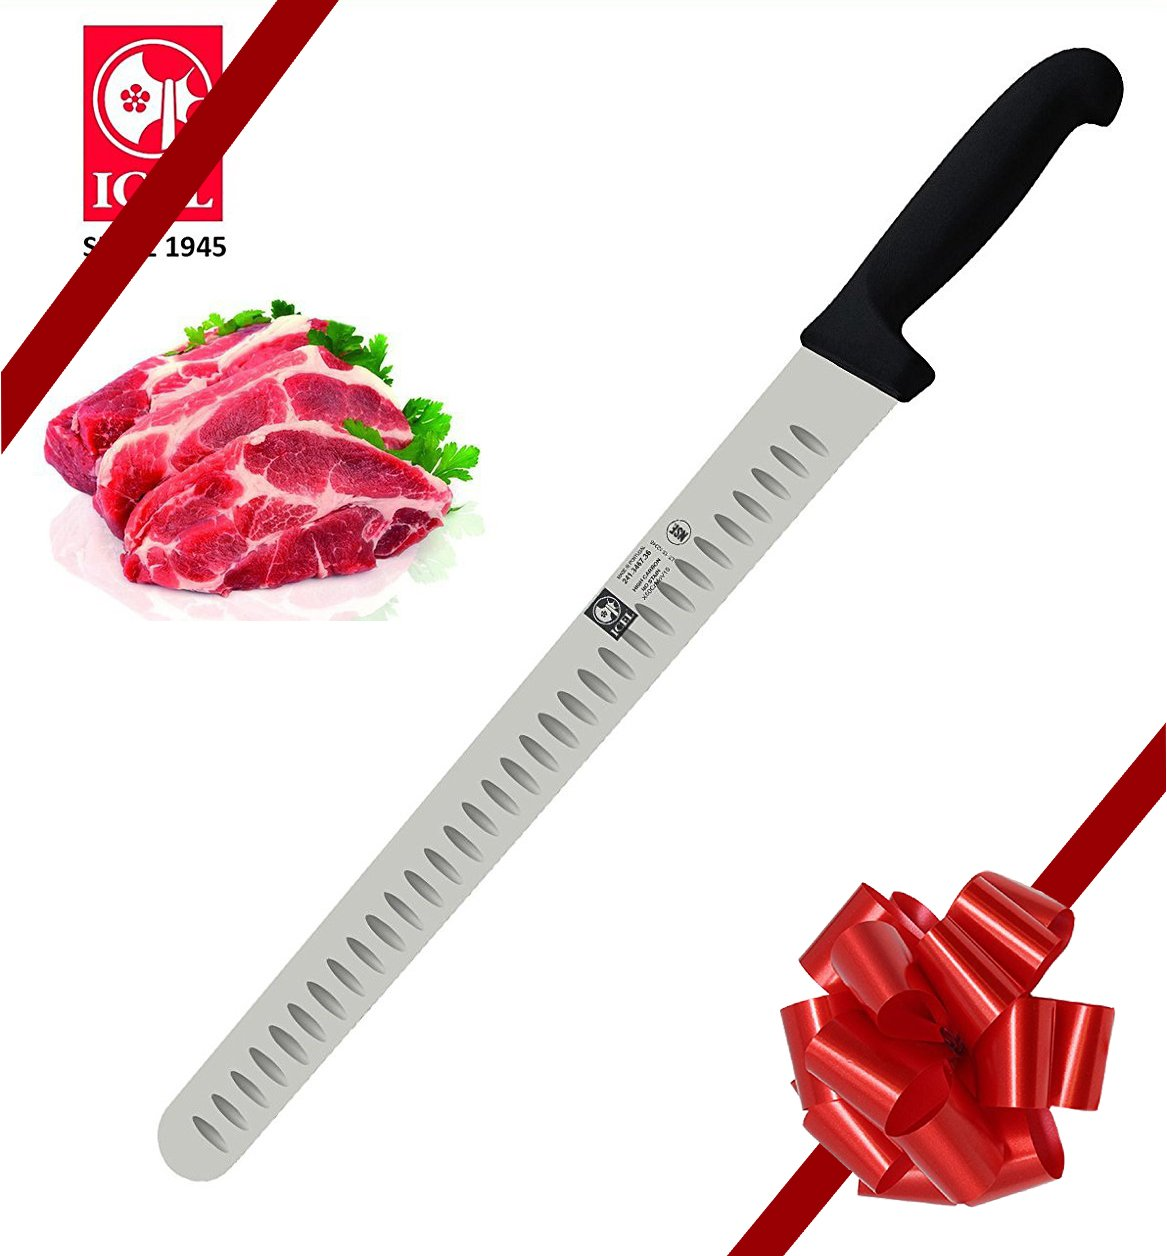 14-inch Blade Granton Edge, Turkey, Salmon, ham Slicer, Meat Slicing Knife. NSF Certified, German Steel,Knife sharpening instruction included, Best Knife to Slice Large Roast and Whole Turkey.